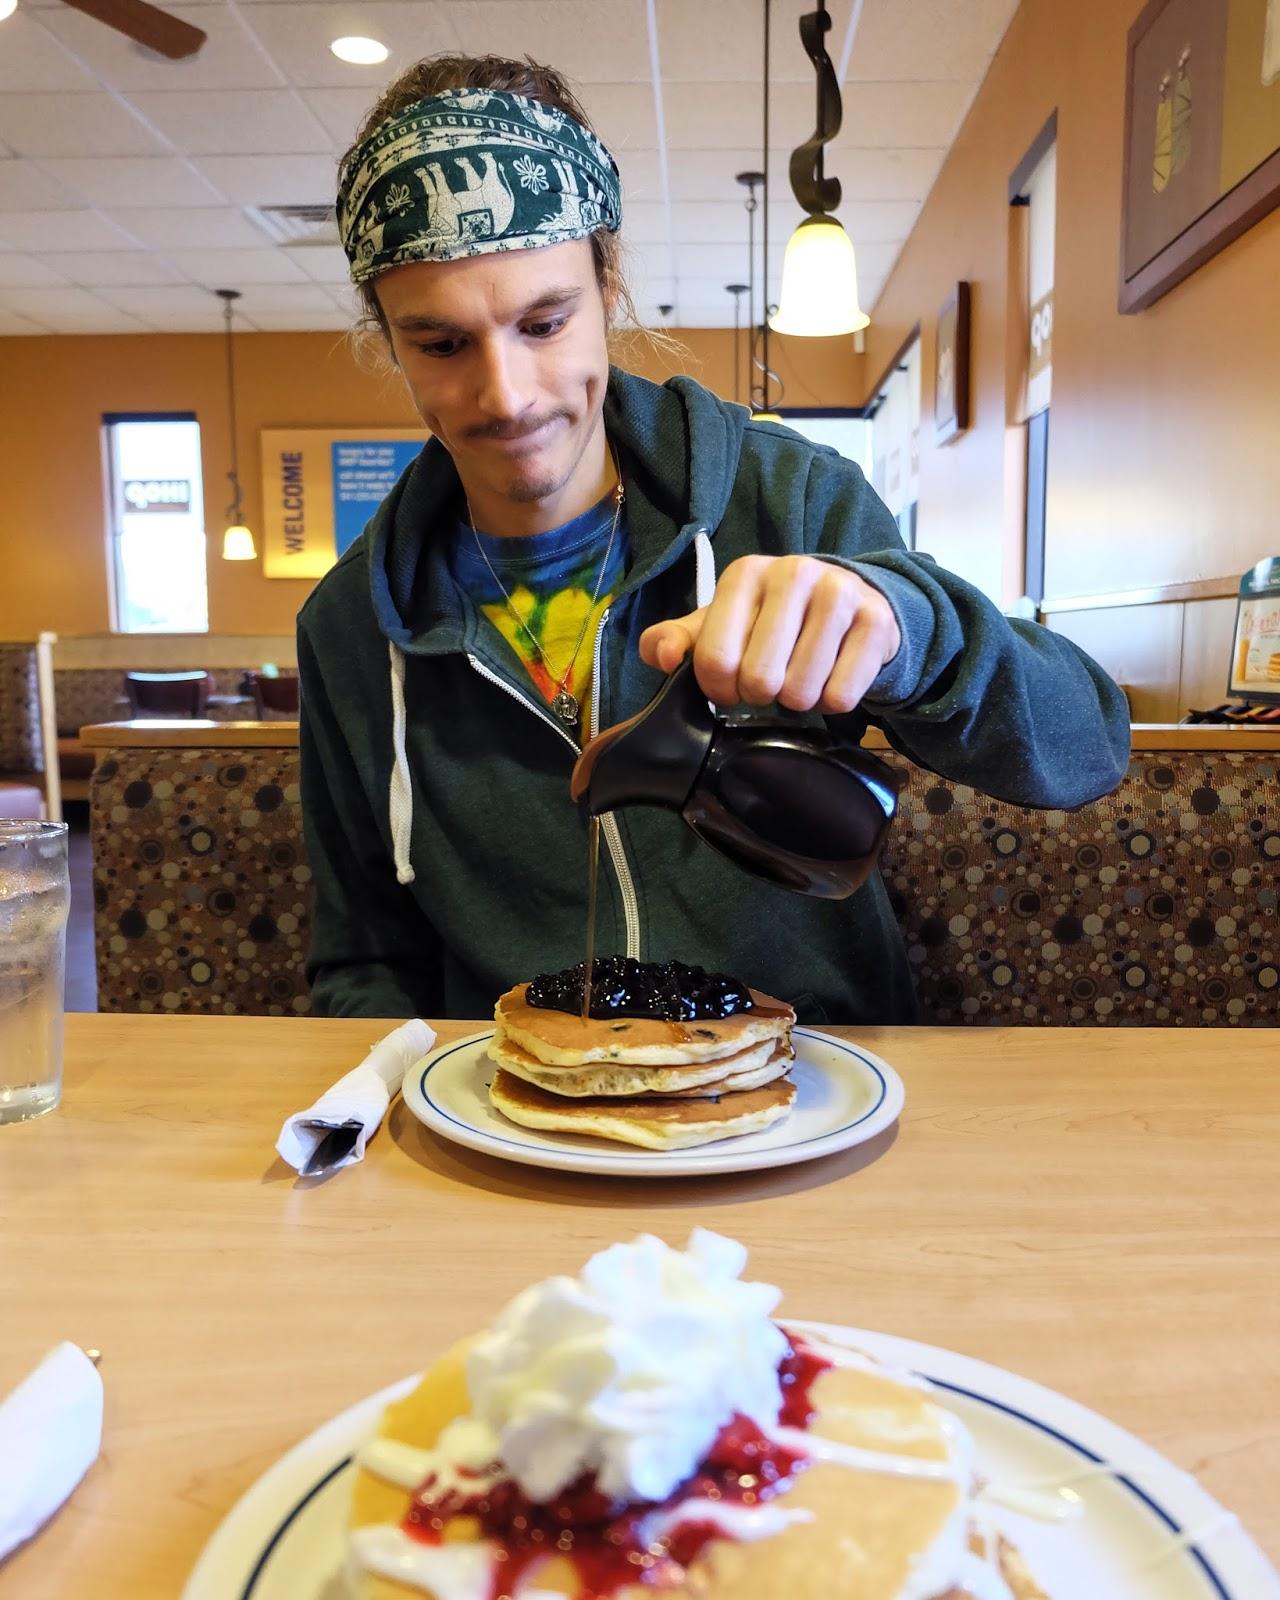 IHOP Pancake House America